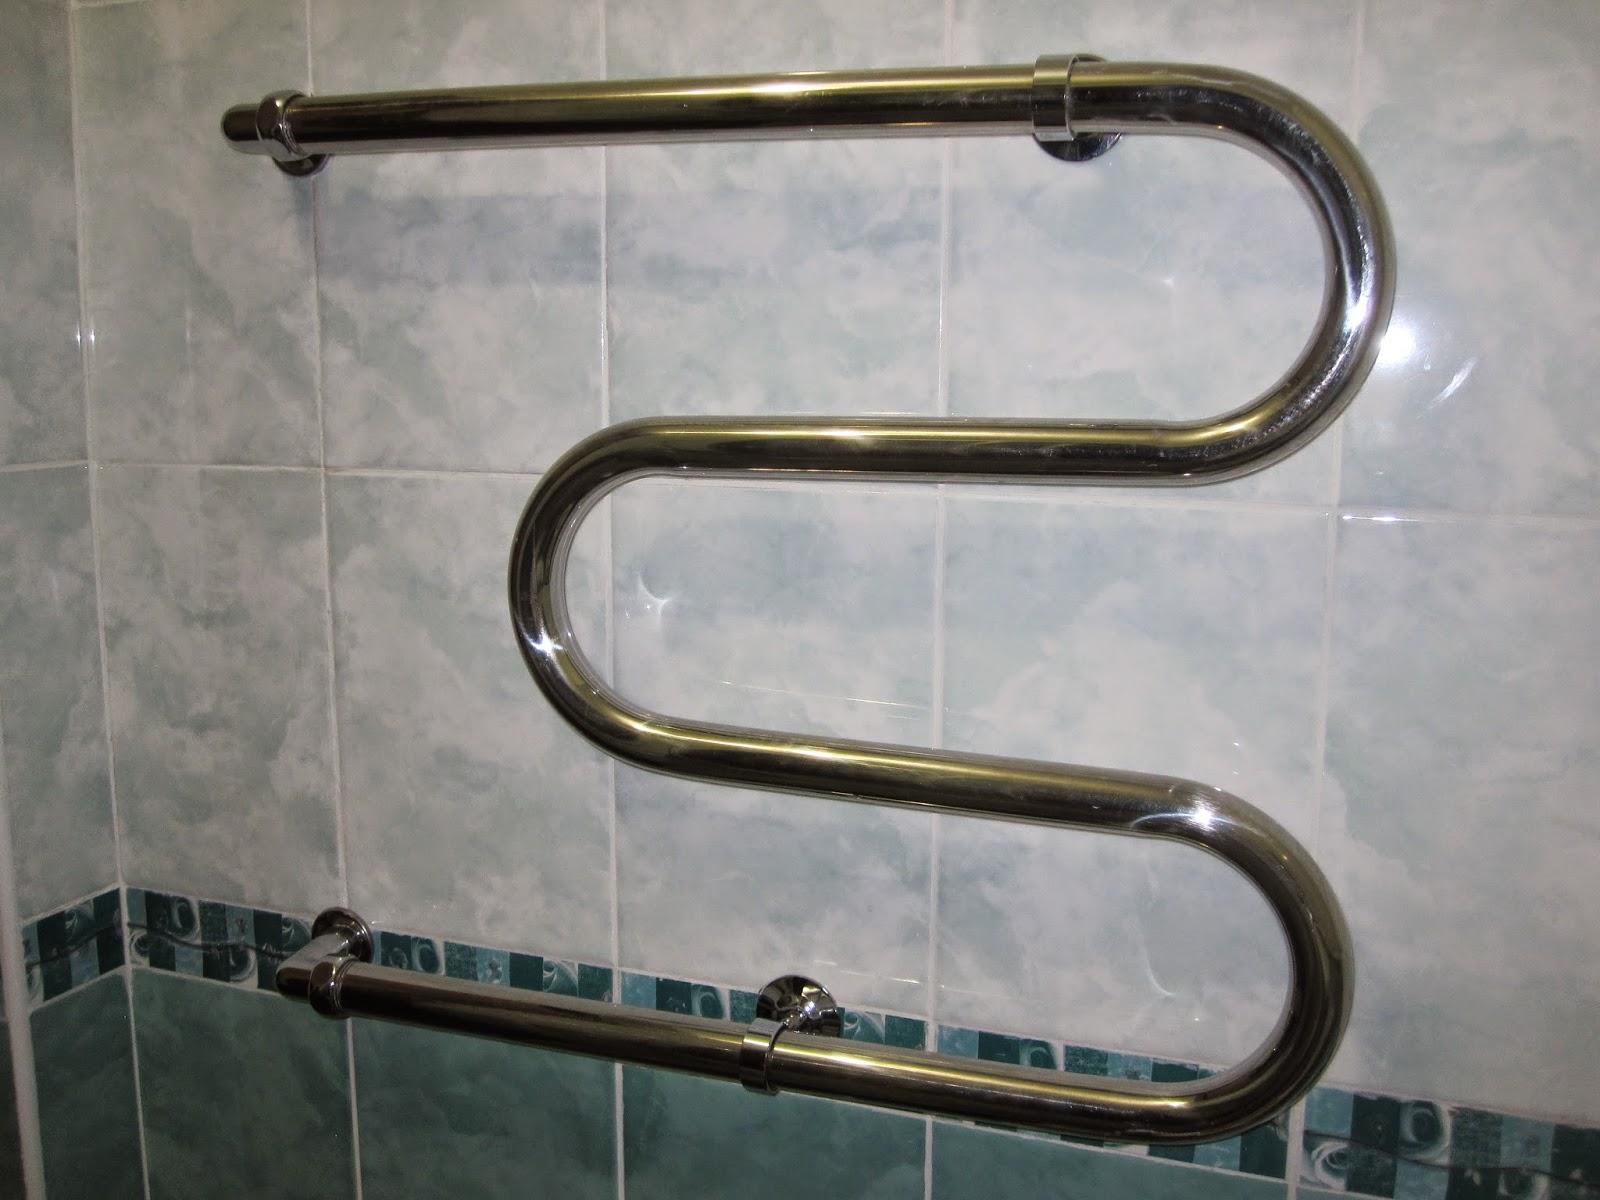 Heated towel rack in Russian hotel.